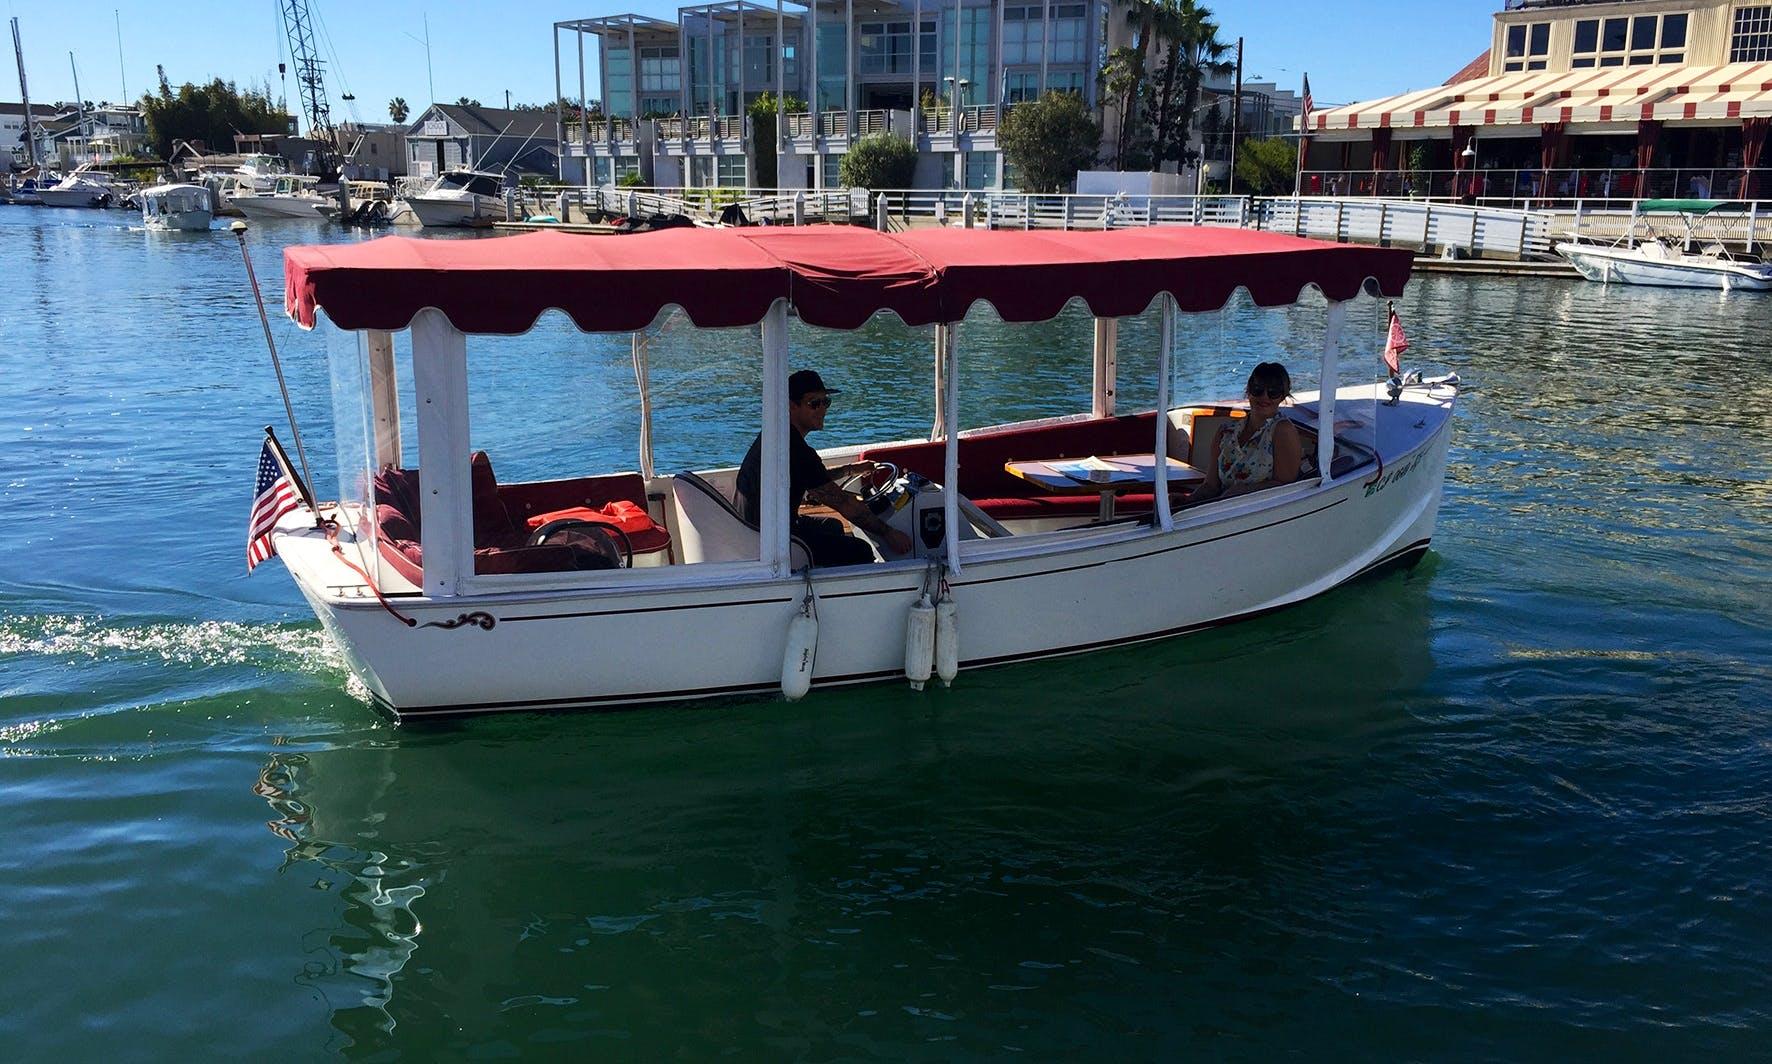 Boat Tour In Newport Beach